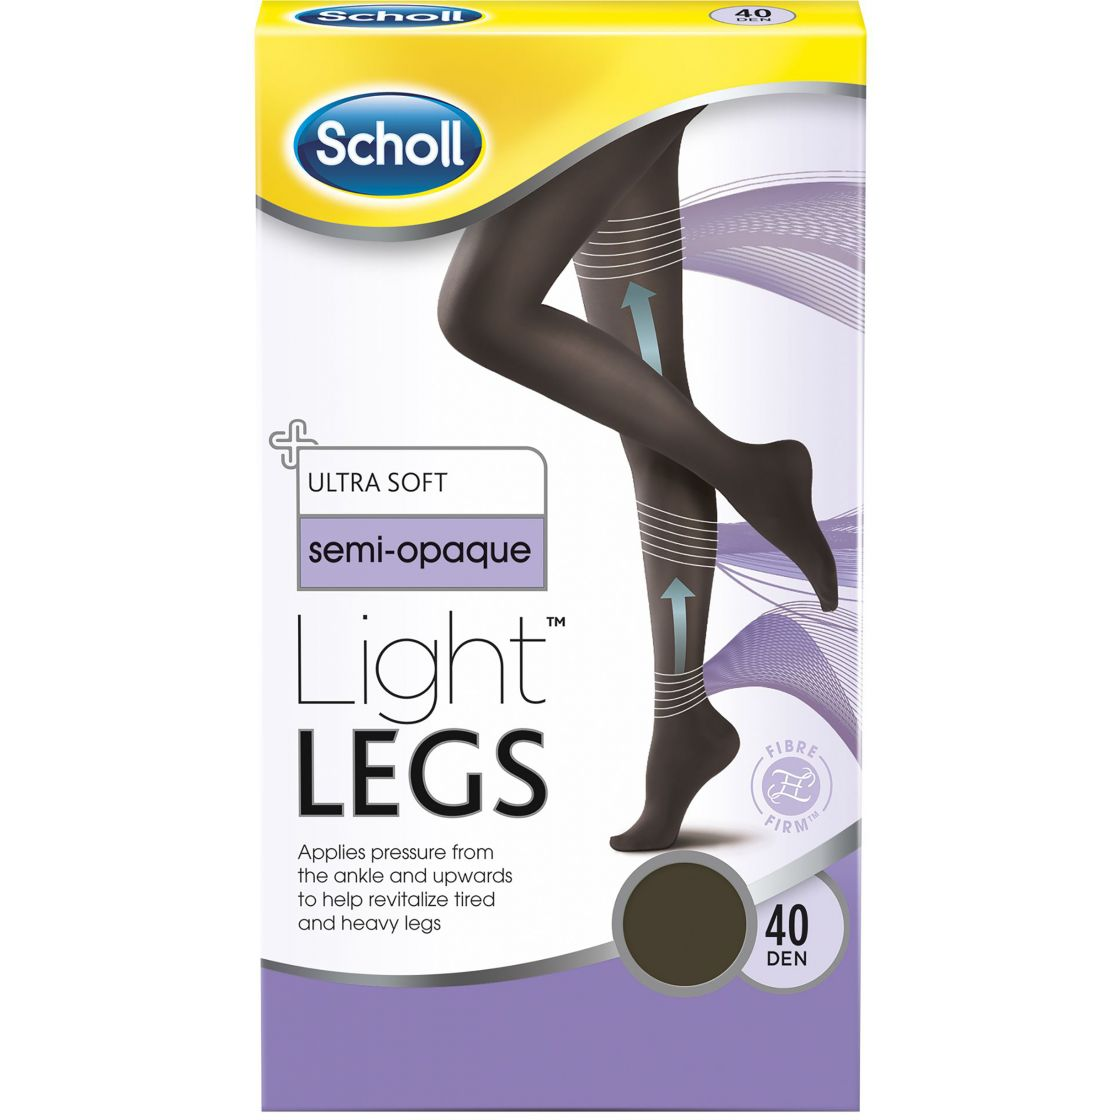 Scholl Light Legs Black 40 DEN Strl M